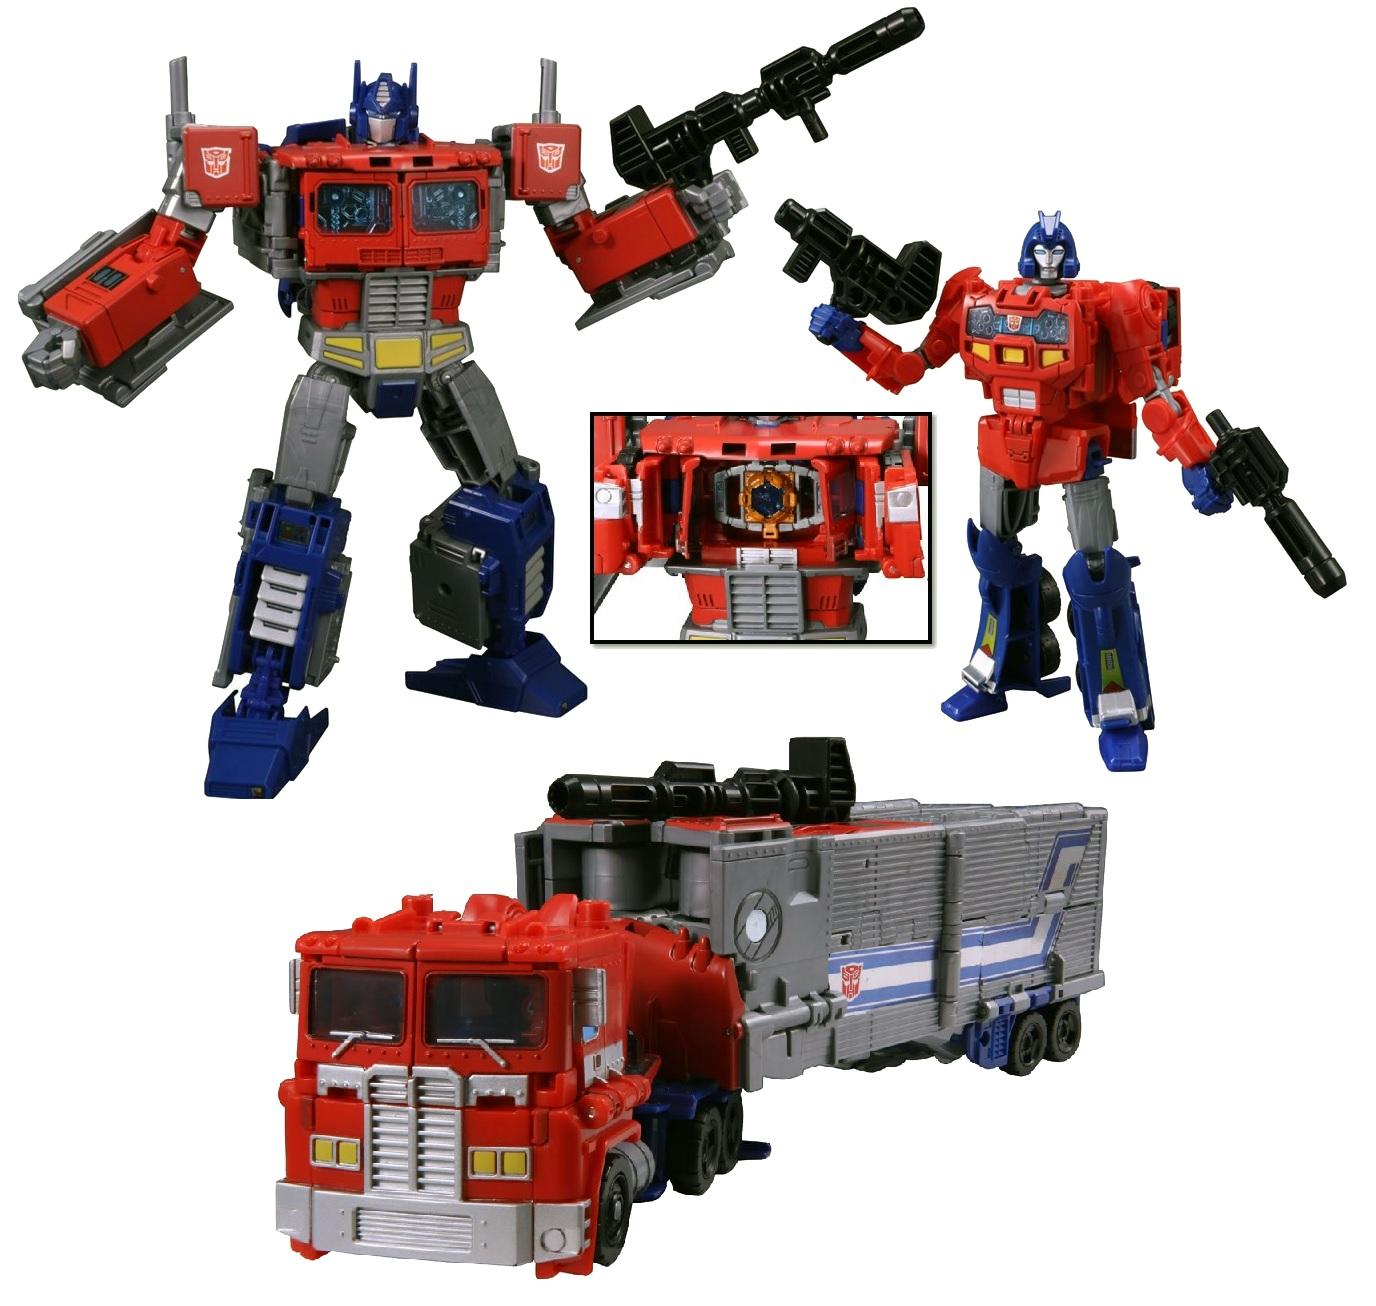 TF-Generations-PotP-Leader-Class-Optimus